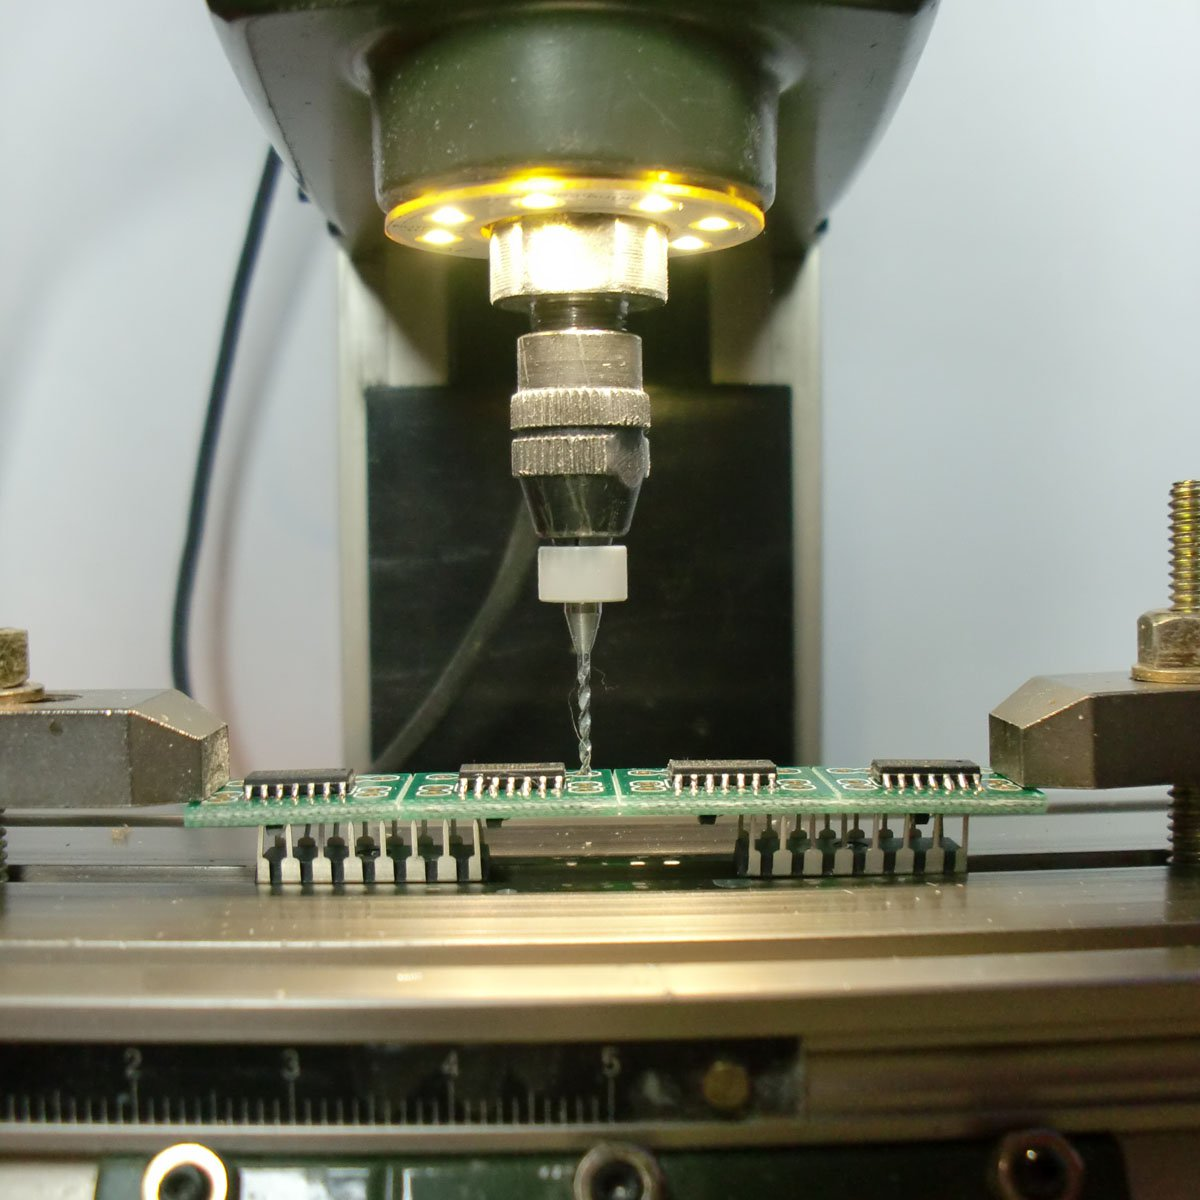 LumenFix 70 - Smart light for Proxxon MF70 from SMDKing on Tindie